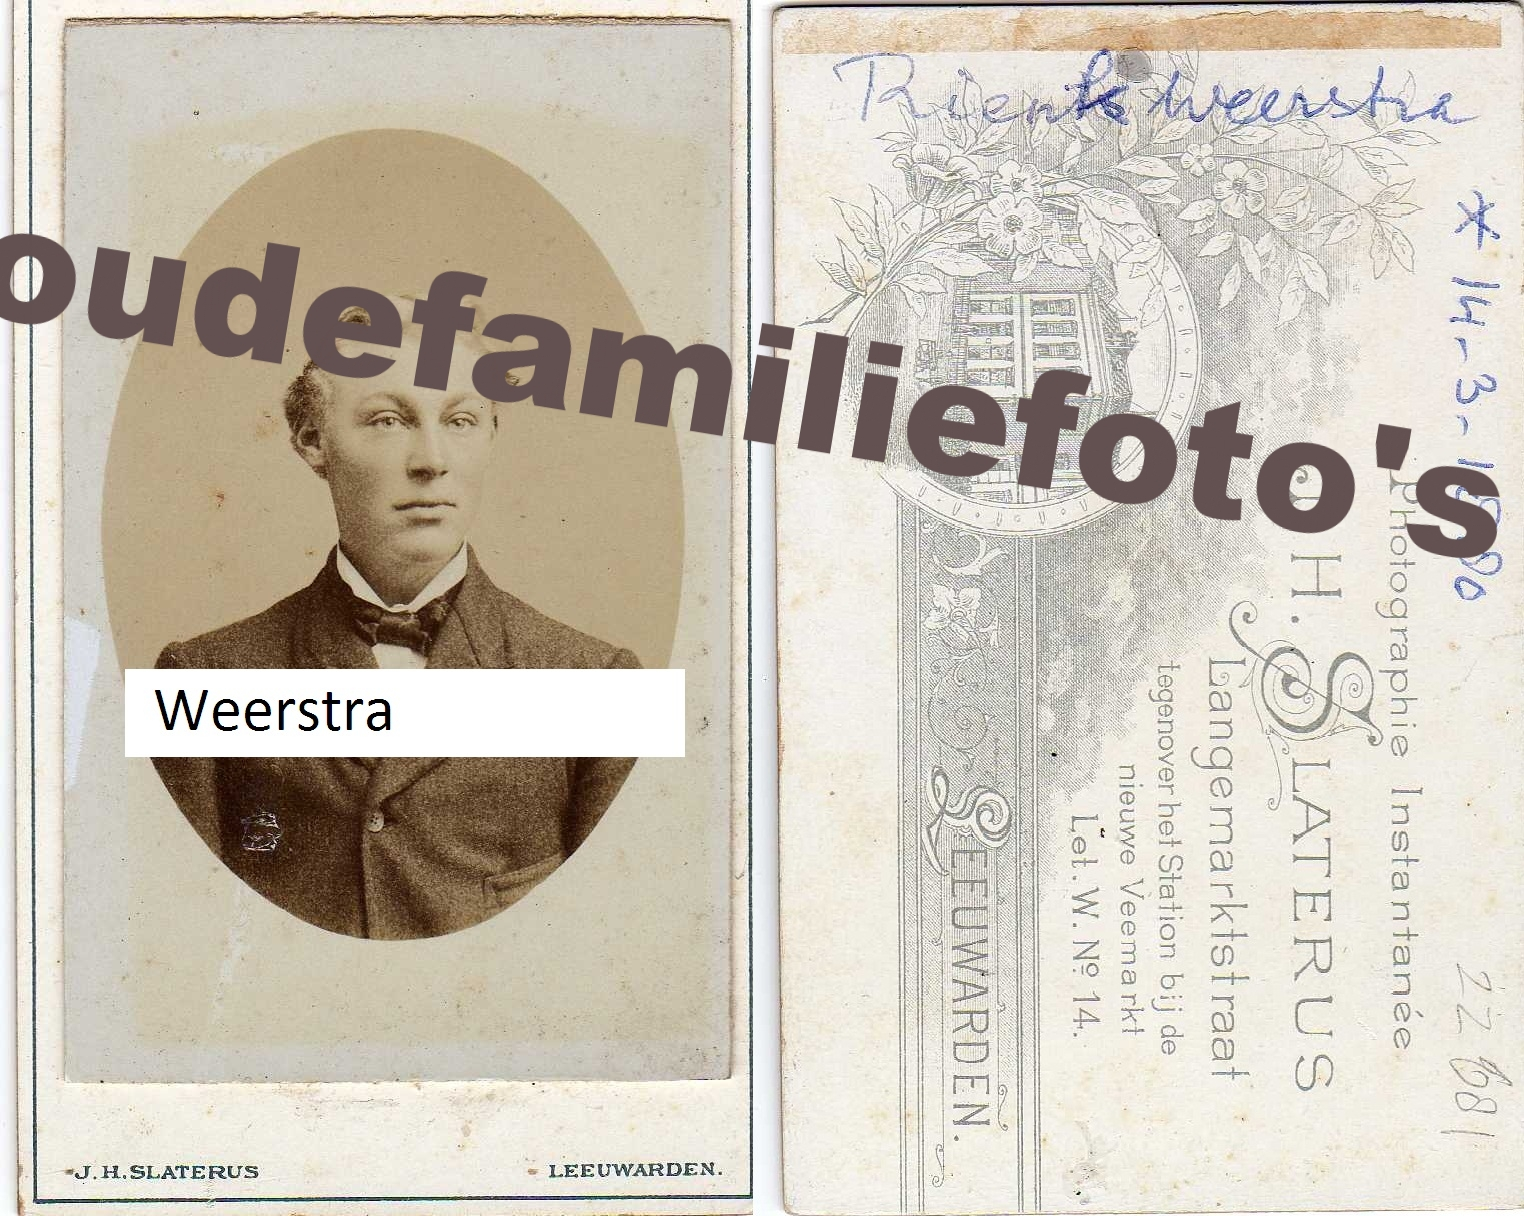 Weerstra, Rienk Geb: 14-03-1880 Wonseradeel. getrouwd met Jeltje Wiarda. ovl. 4-9-1958 € 4.00